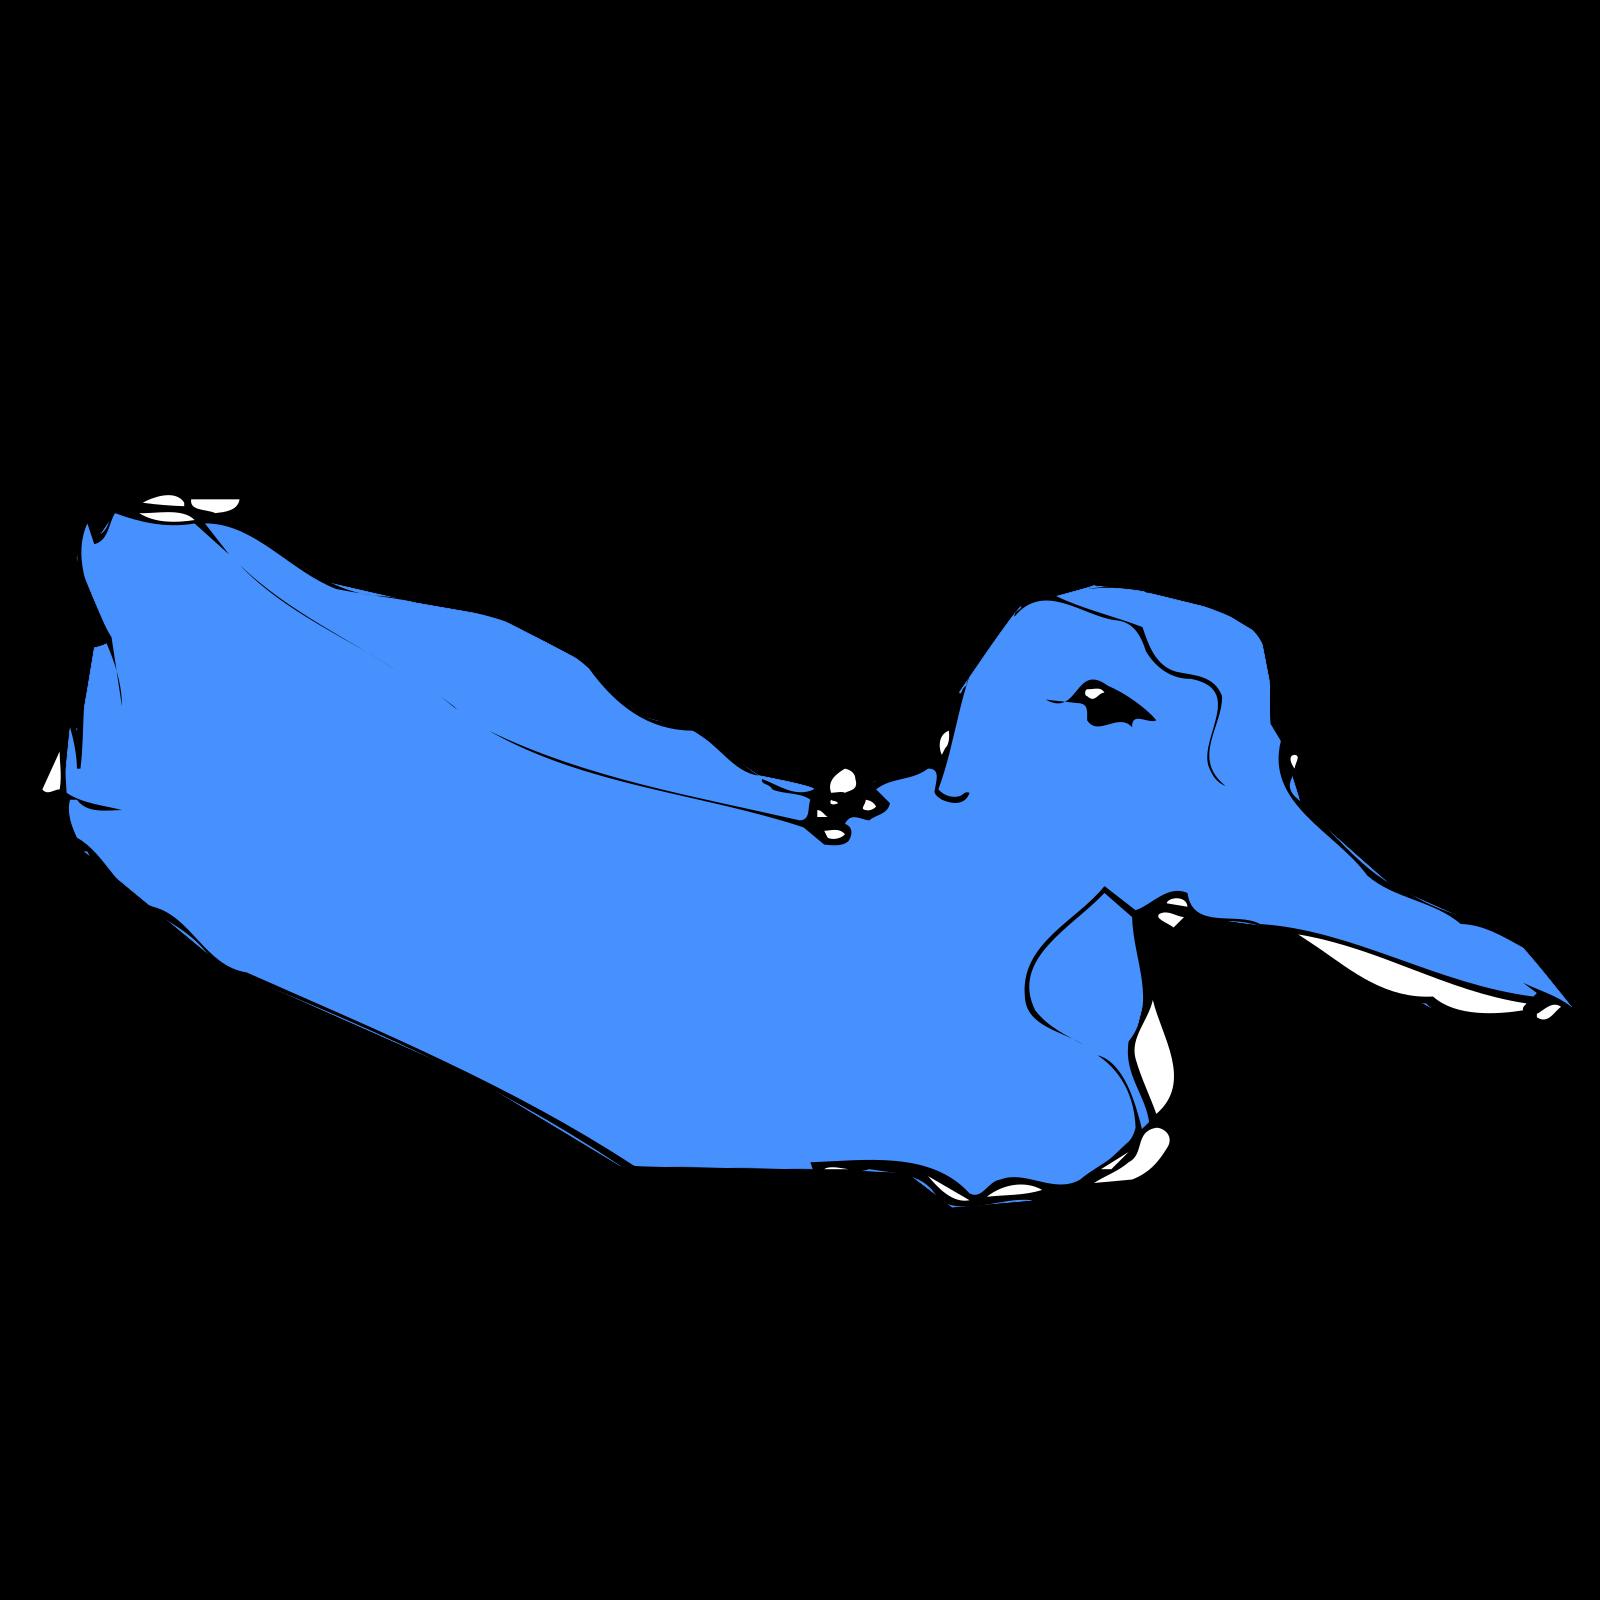 Simple Blue Duck Sketch Svg Vector Simple Blue Duck Sketch Clip Art Svg Clipart